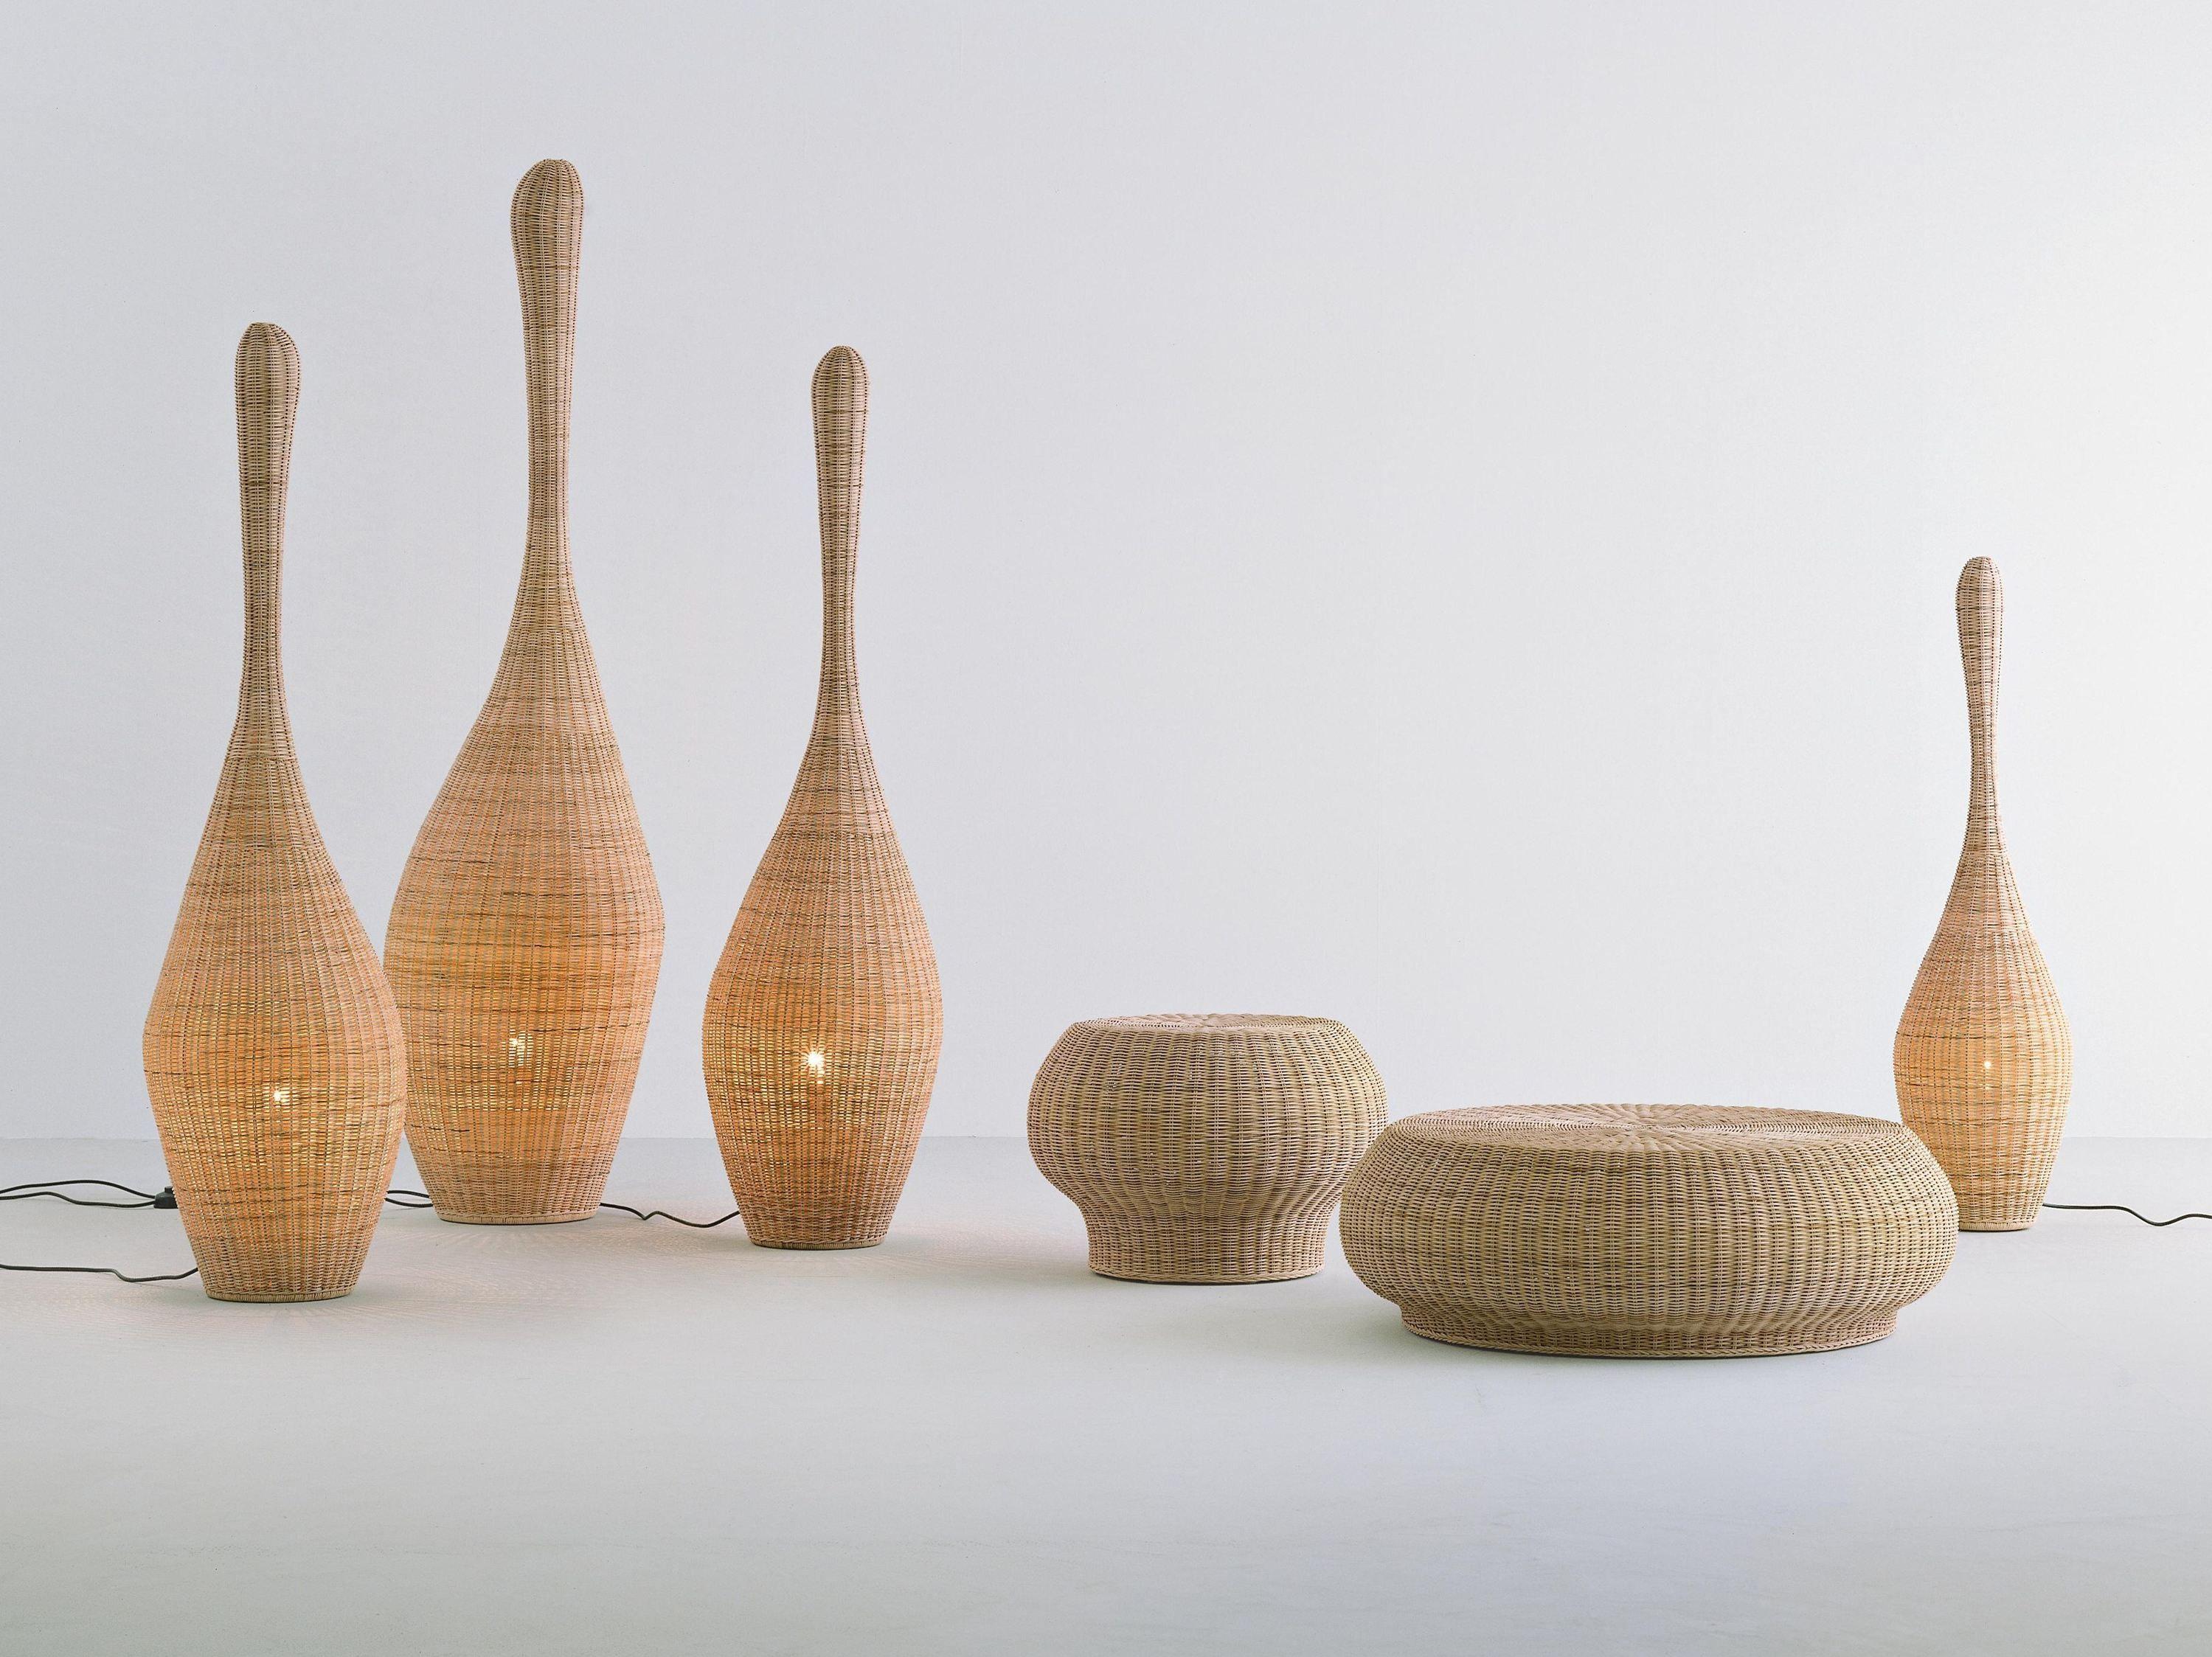 Statuette Of Wicker Table Lamps Concept